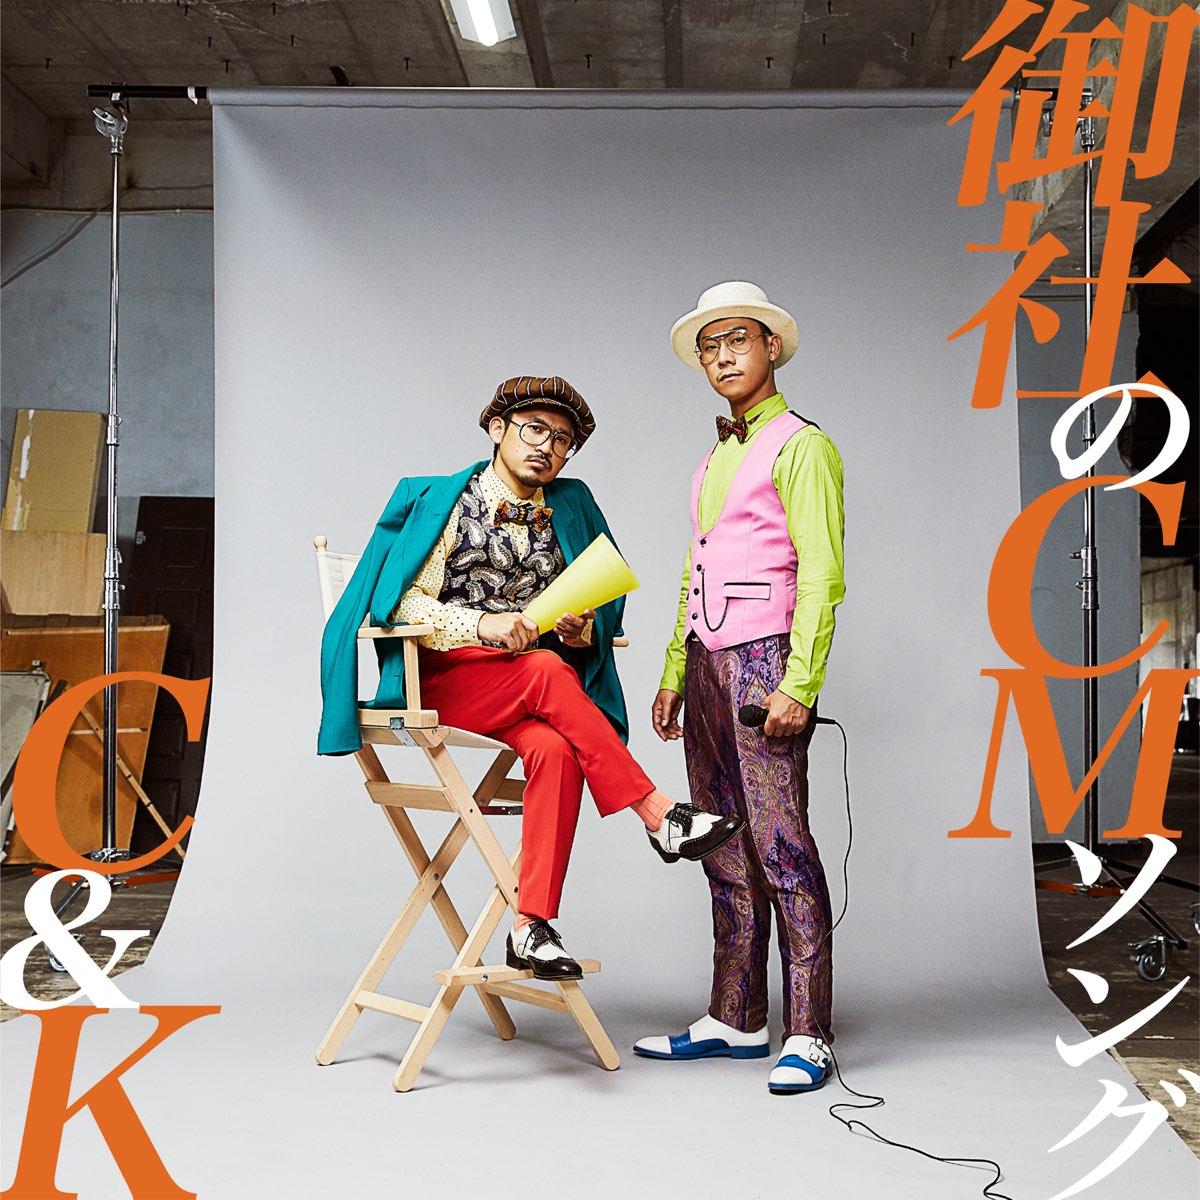 『C&K - MAMANIE』収録の『御社のCMソング』ジャケット